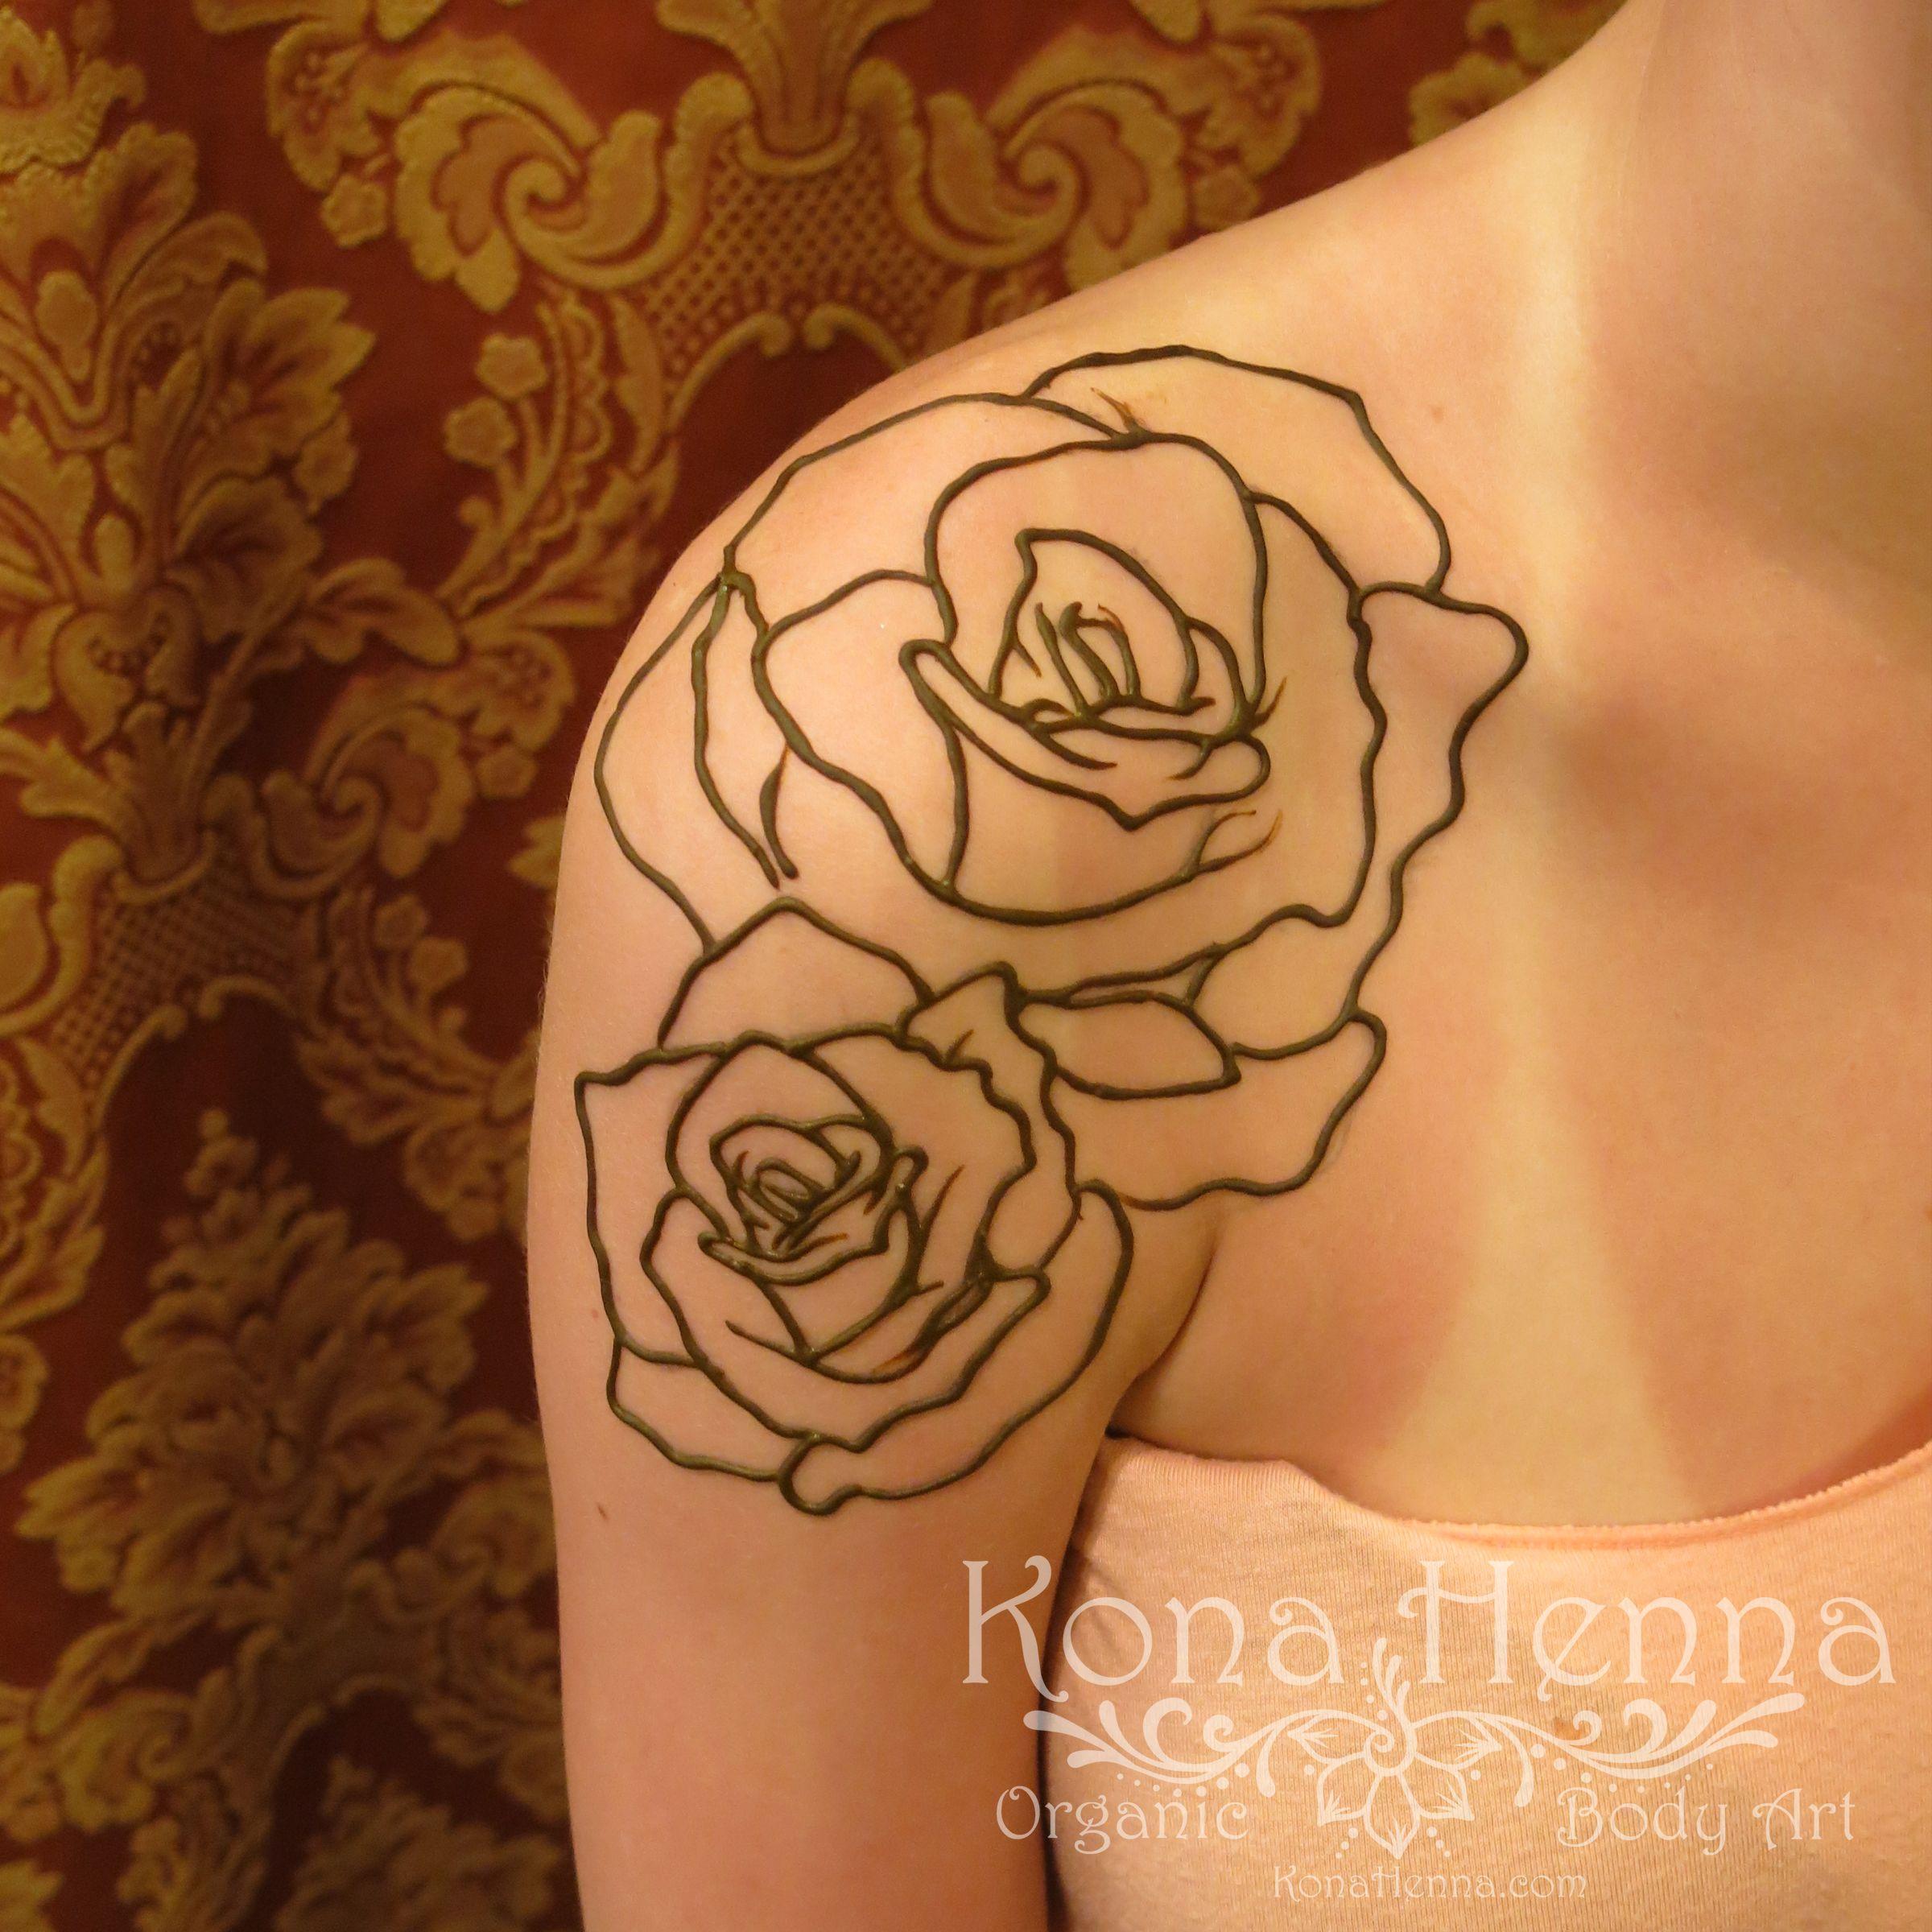 Rose Henna Tattoo Designs On Wrist: Organic Henna Products. Professional Henna Studio